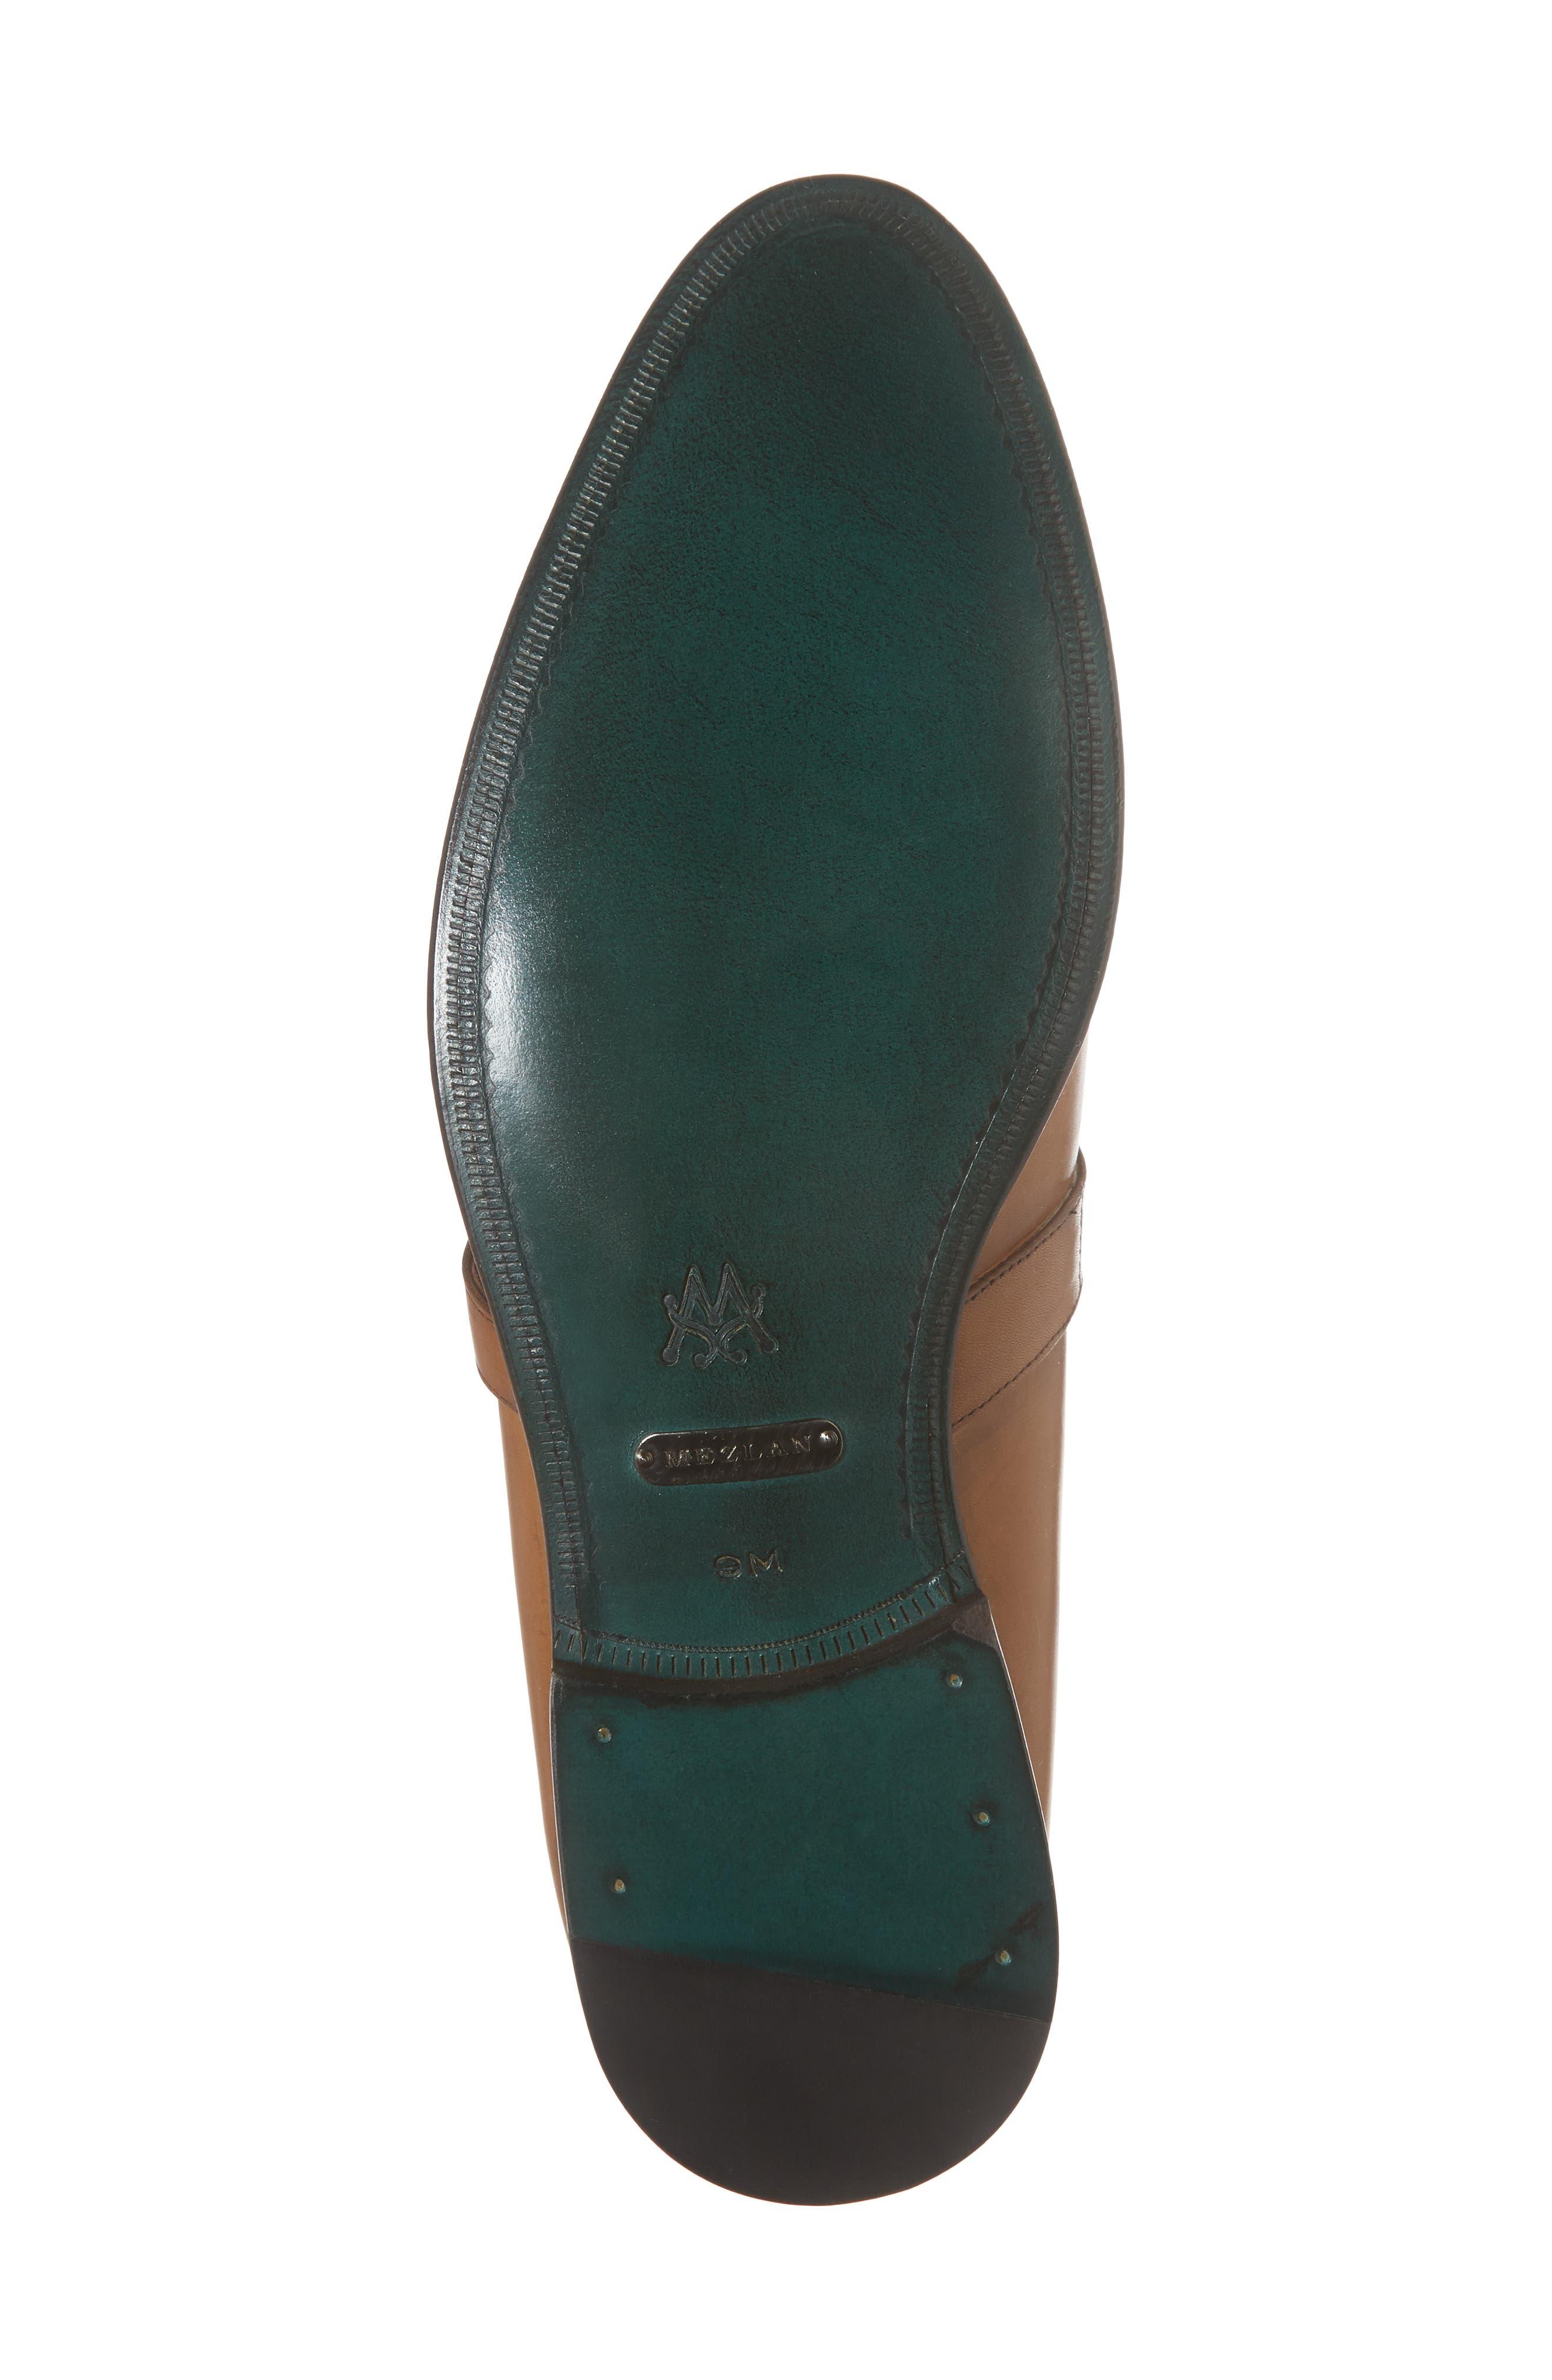 Octavio Kiltie Loafer,                             Alternate thumbnail 6, color,                             Tan Leather